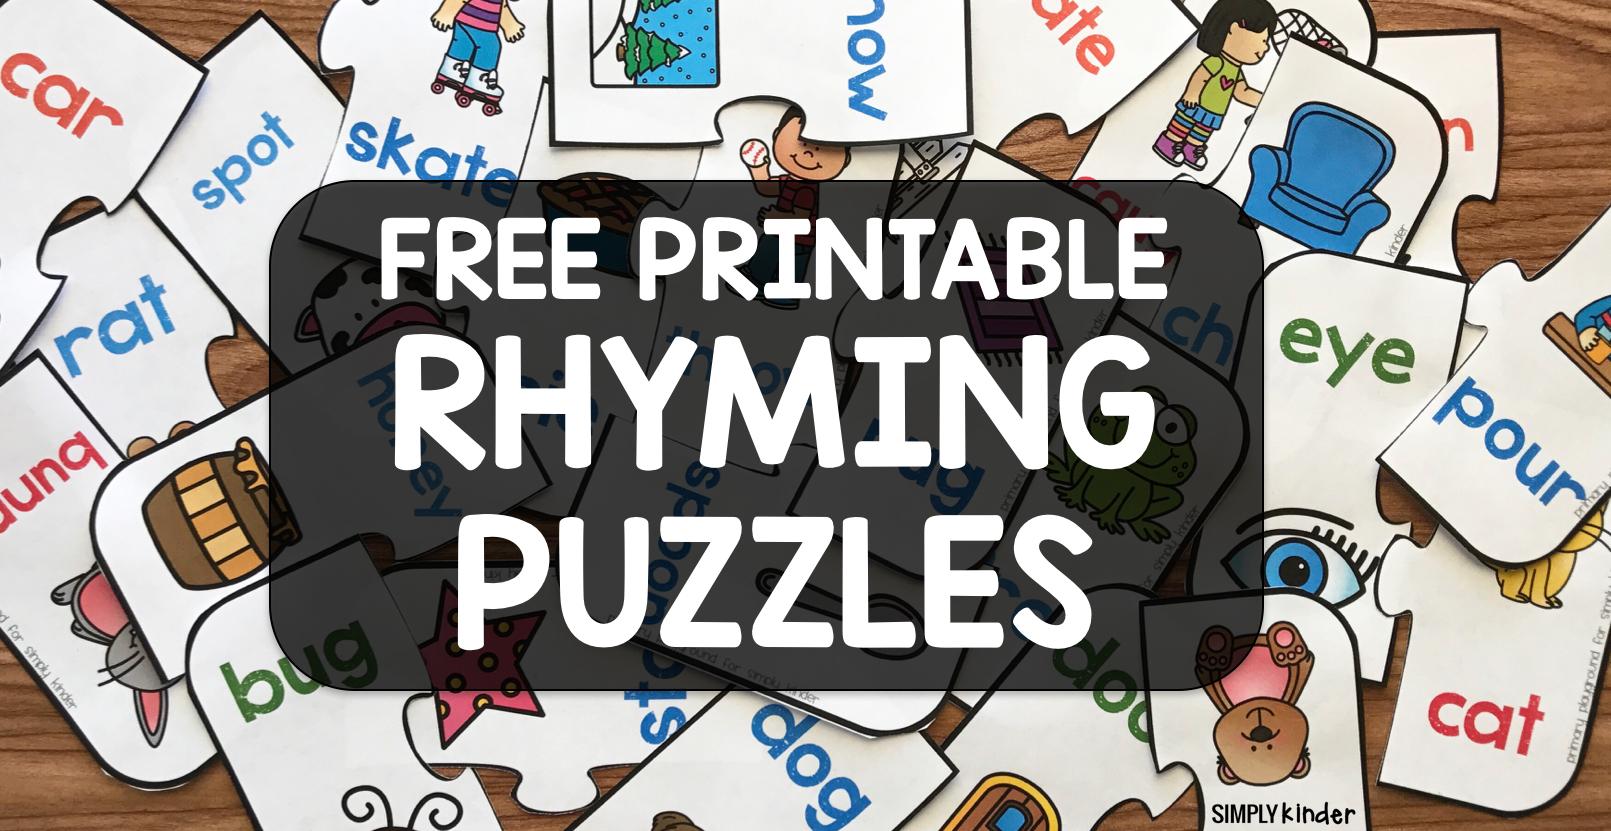 Free Printable Rhyming Puzzles - Simply Kinder - Printable Rhyming Puzzles